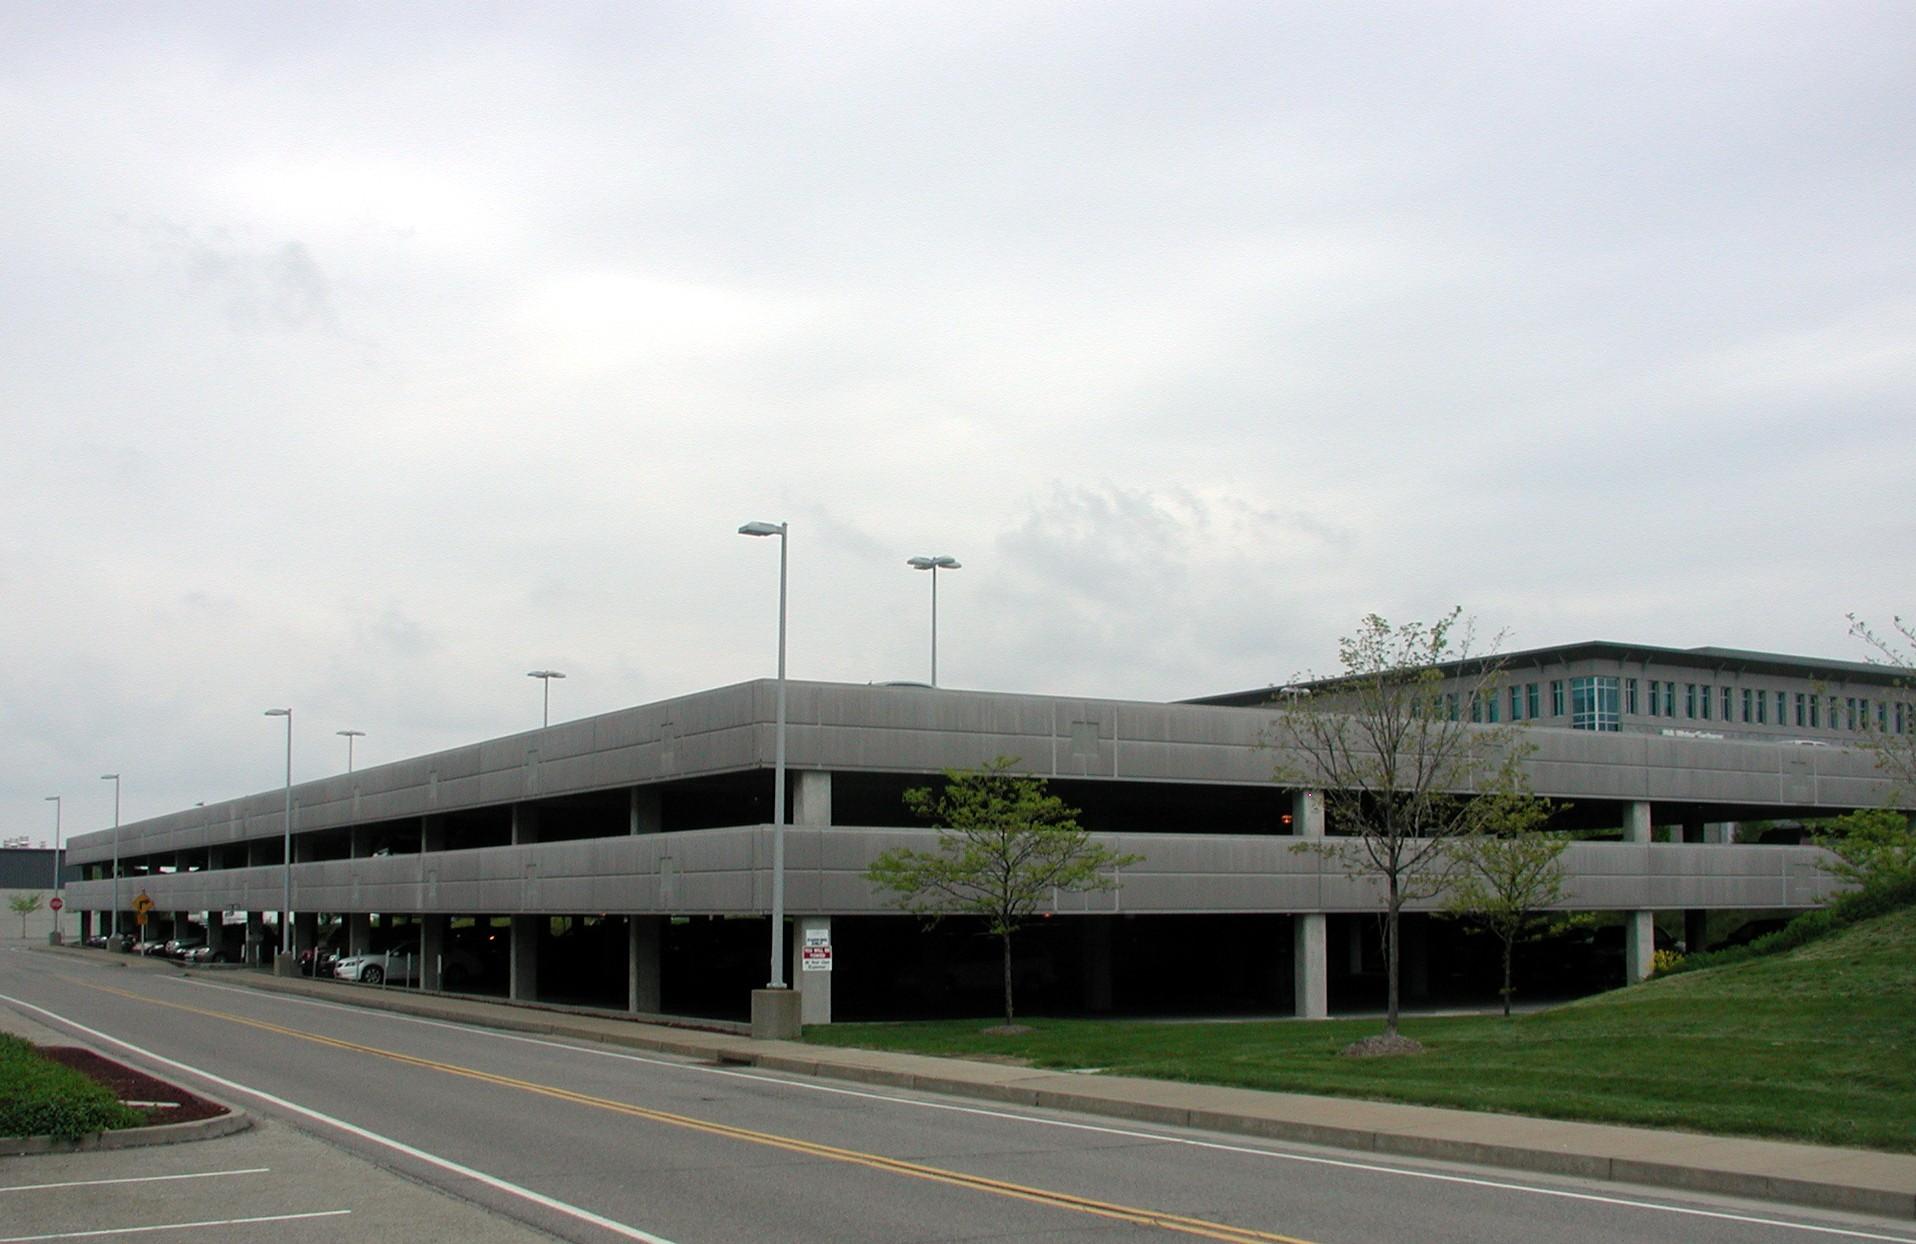 AIRSIDE BUSINESS PARK - POST TENSION GARAGE